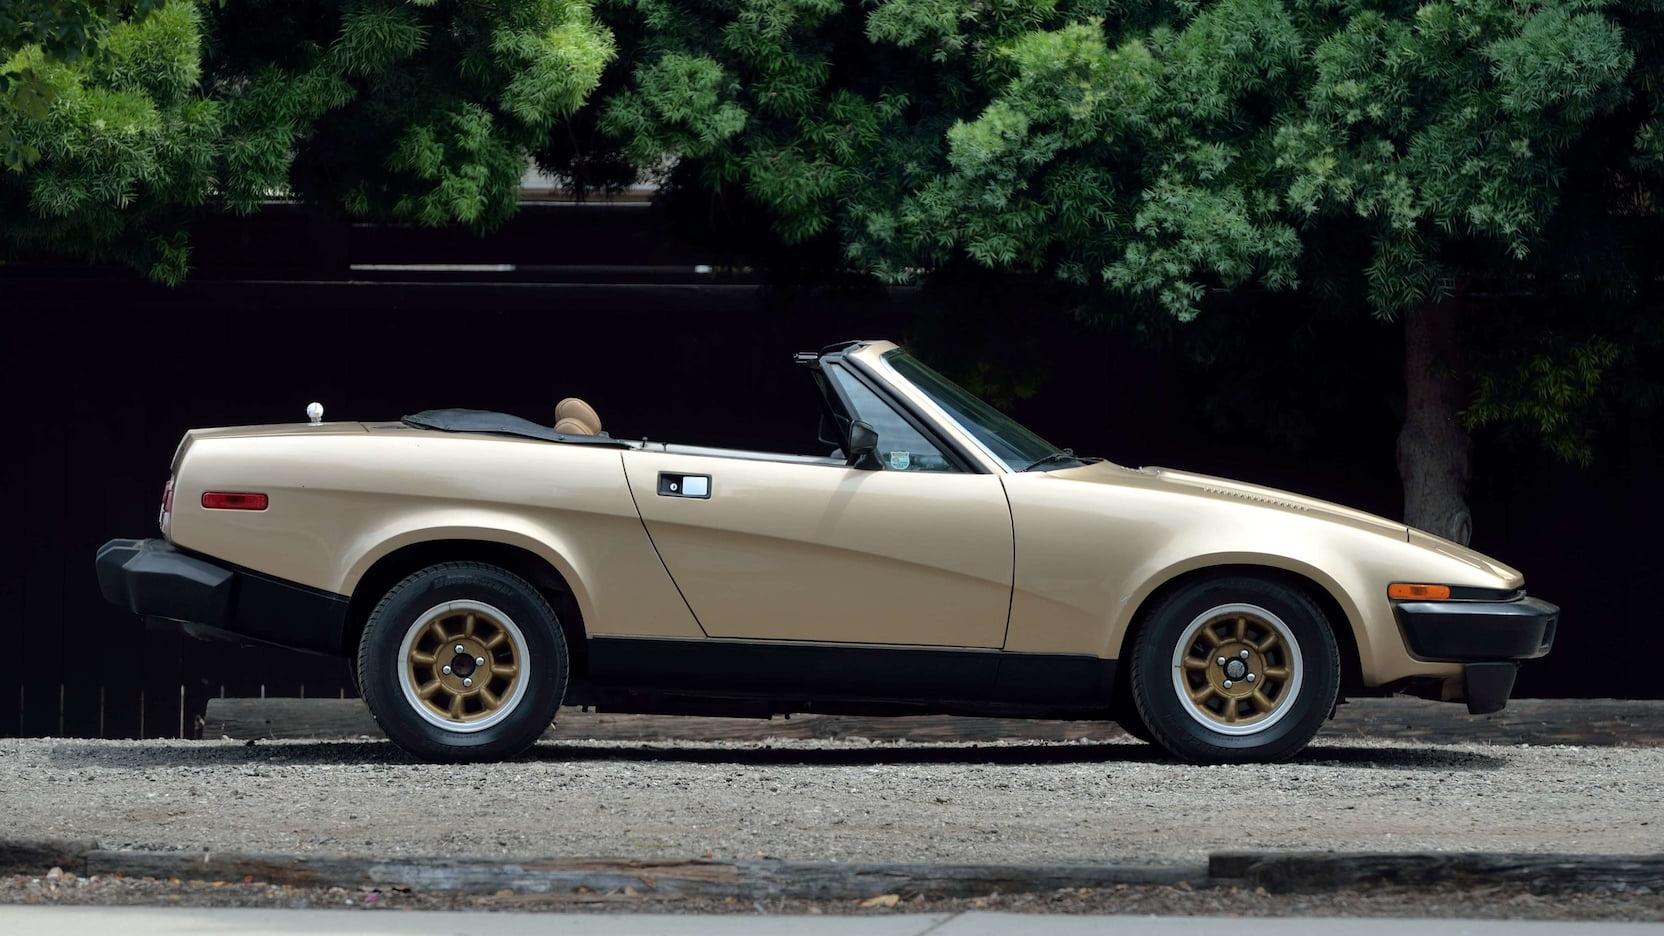 1979 Triumph TR7 passenger side profile